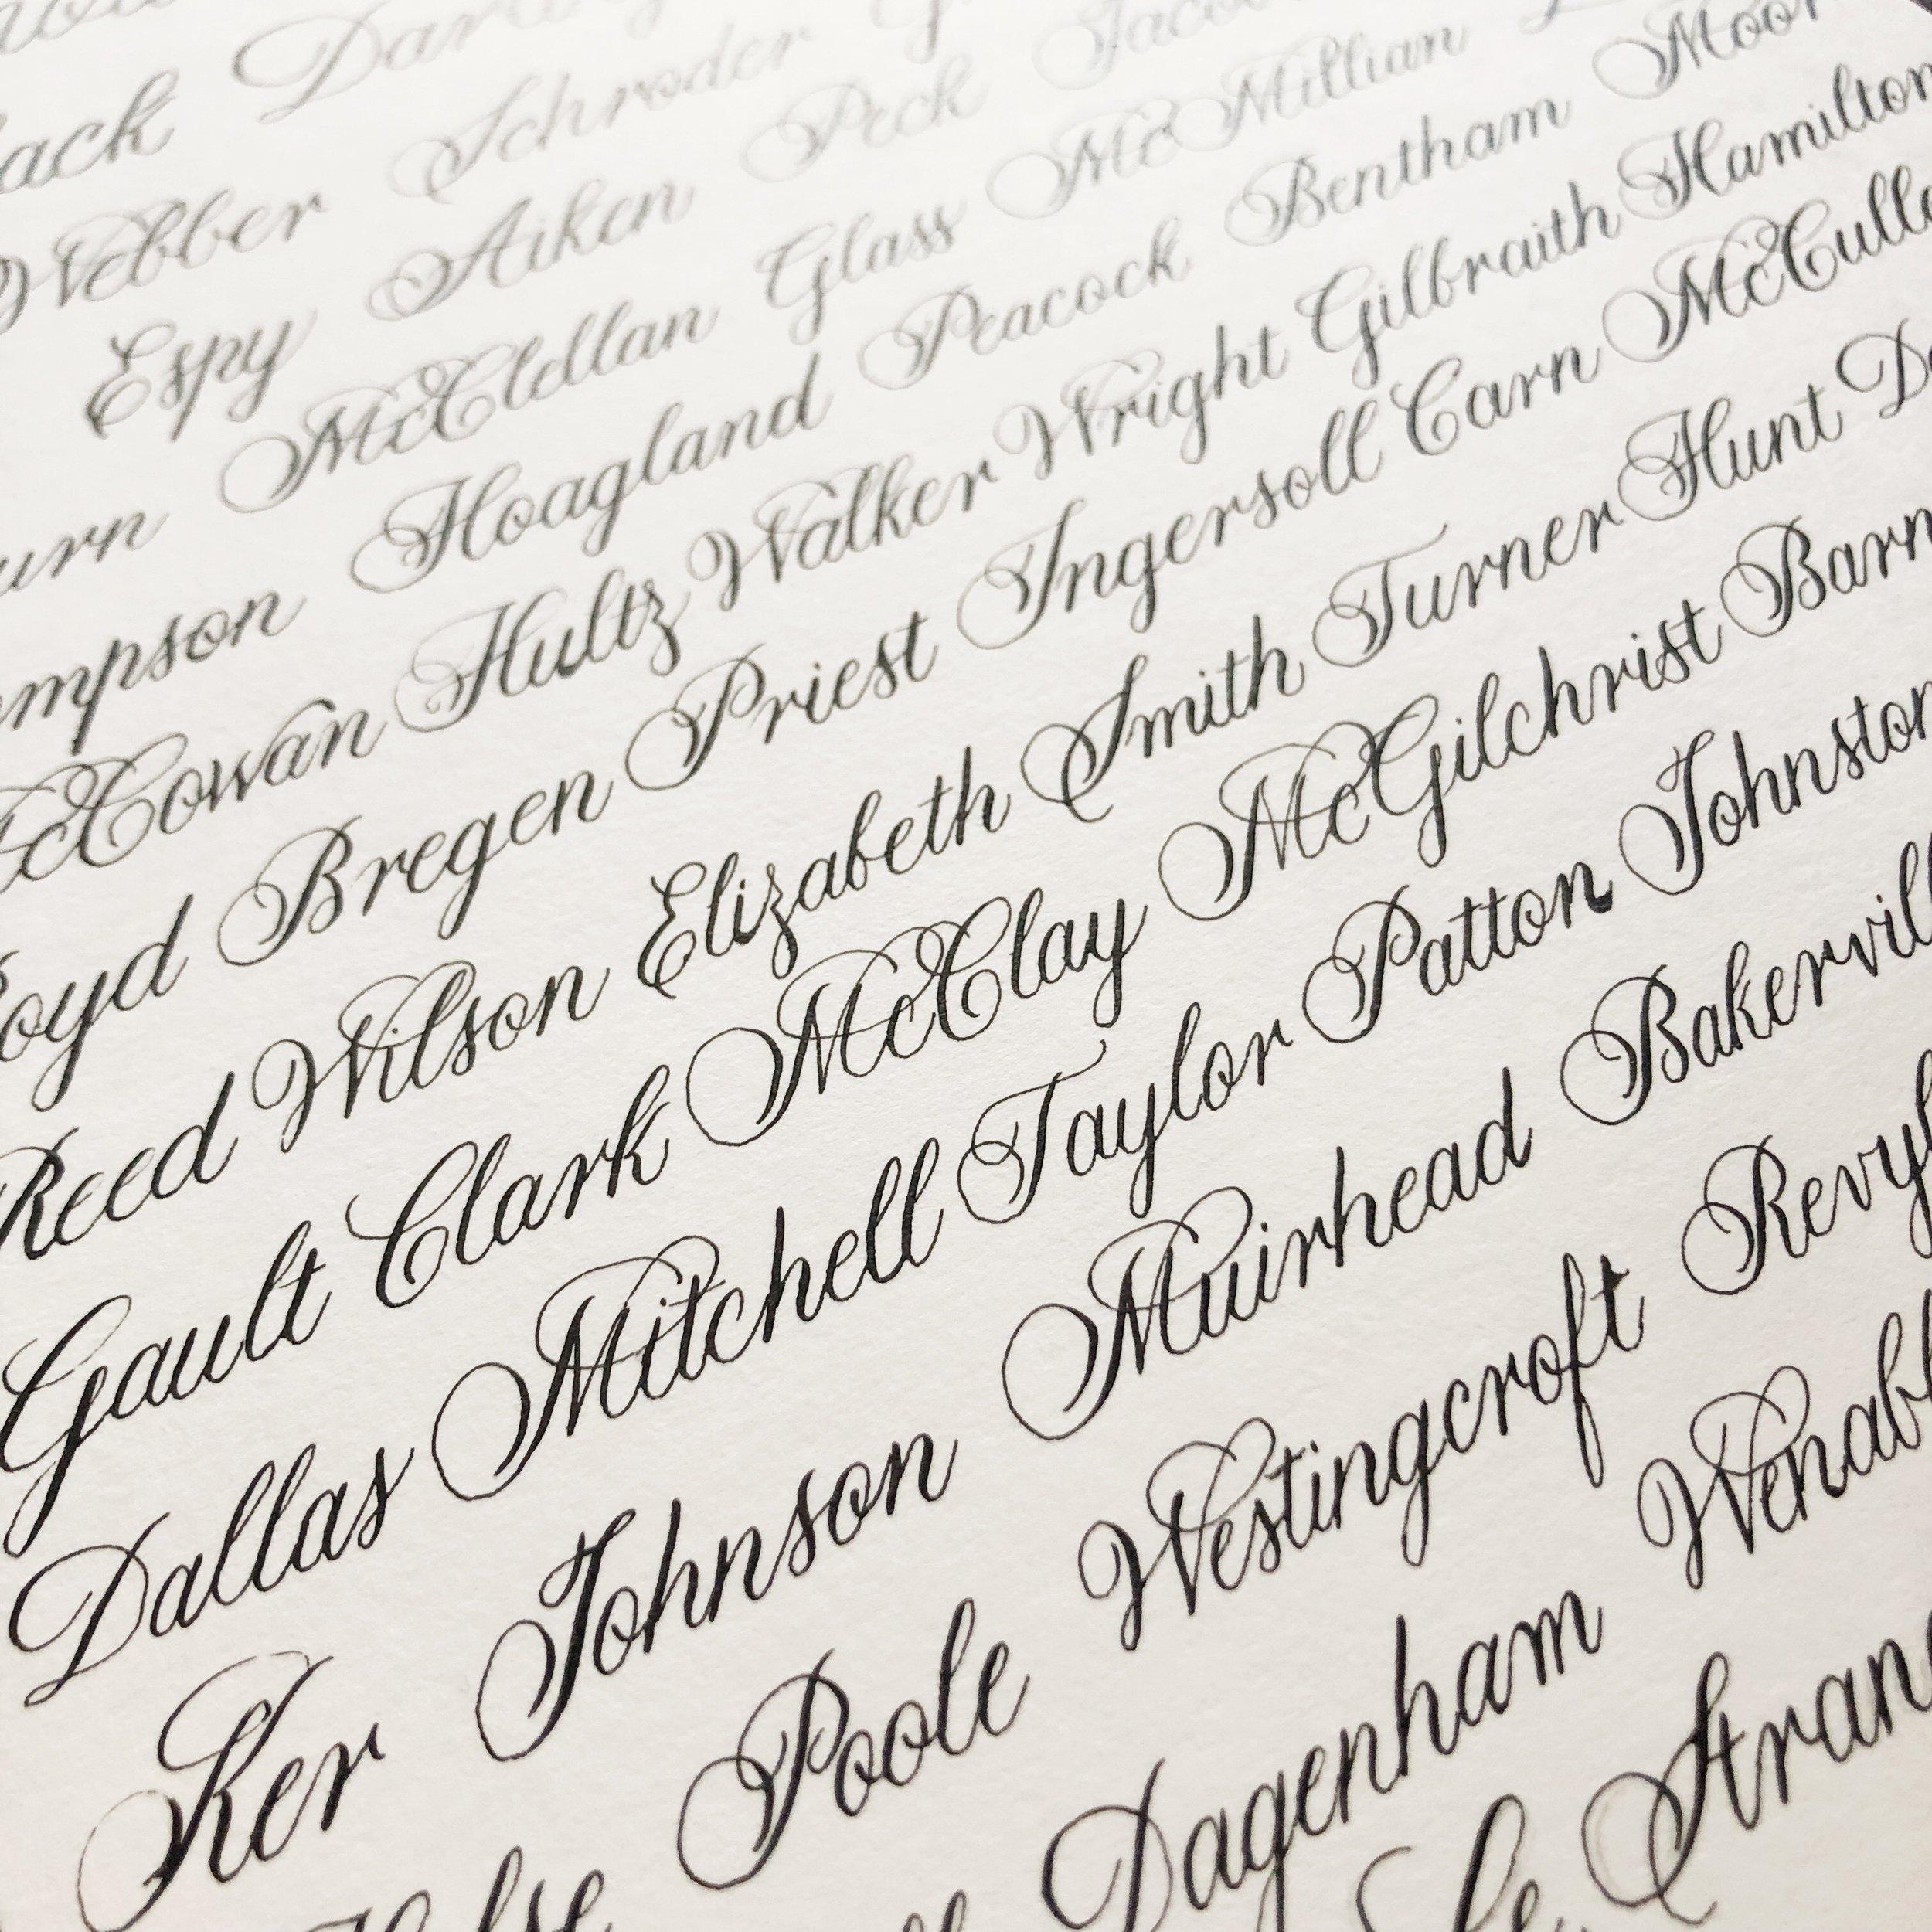 Central PA, York PA, JesSmith Designs, custom, wedding, invitations, bridal, Harrisburg, hanover, calligraphy, baltimore, wedding invitations, lancaster, gettysburg, 12-18 15.58.53.jpg